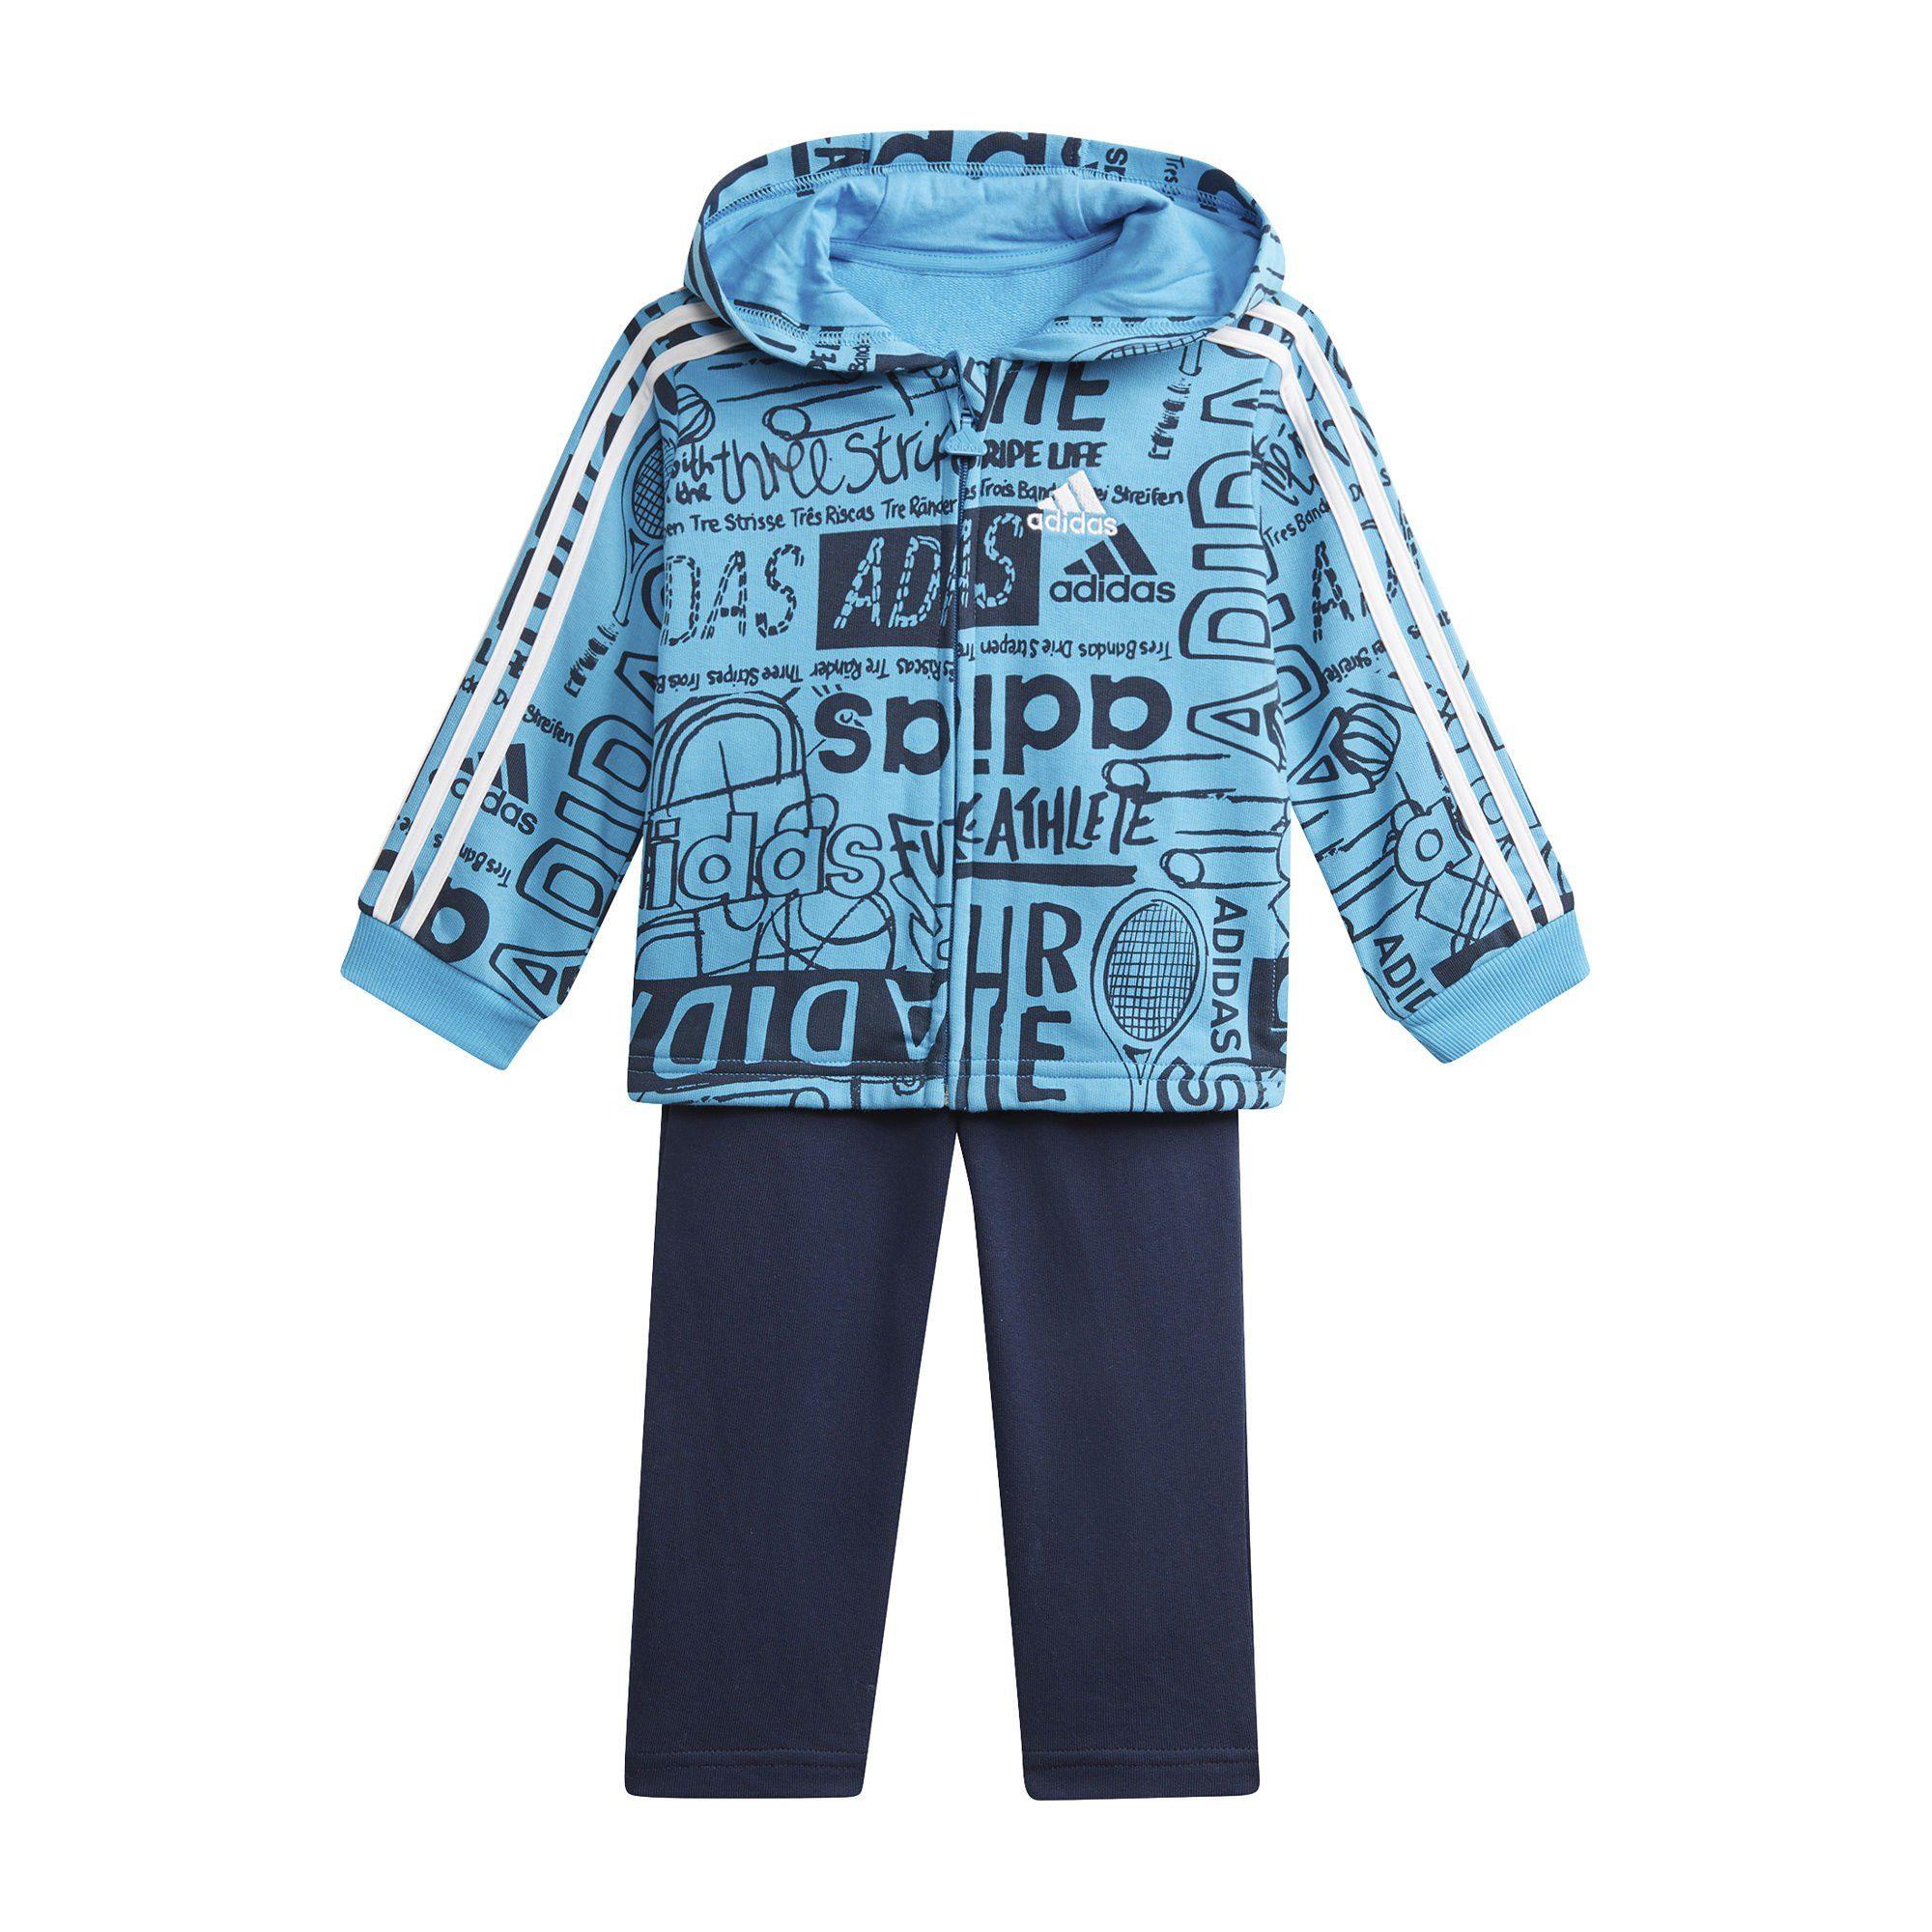 adidas Performance Trainingsanzug »Graphic Fleece Jogginganzug« online kaufen | OTTO